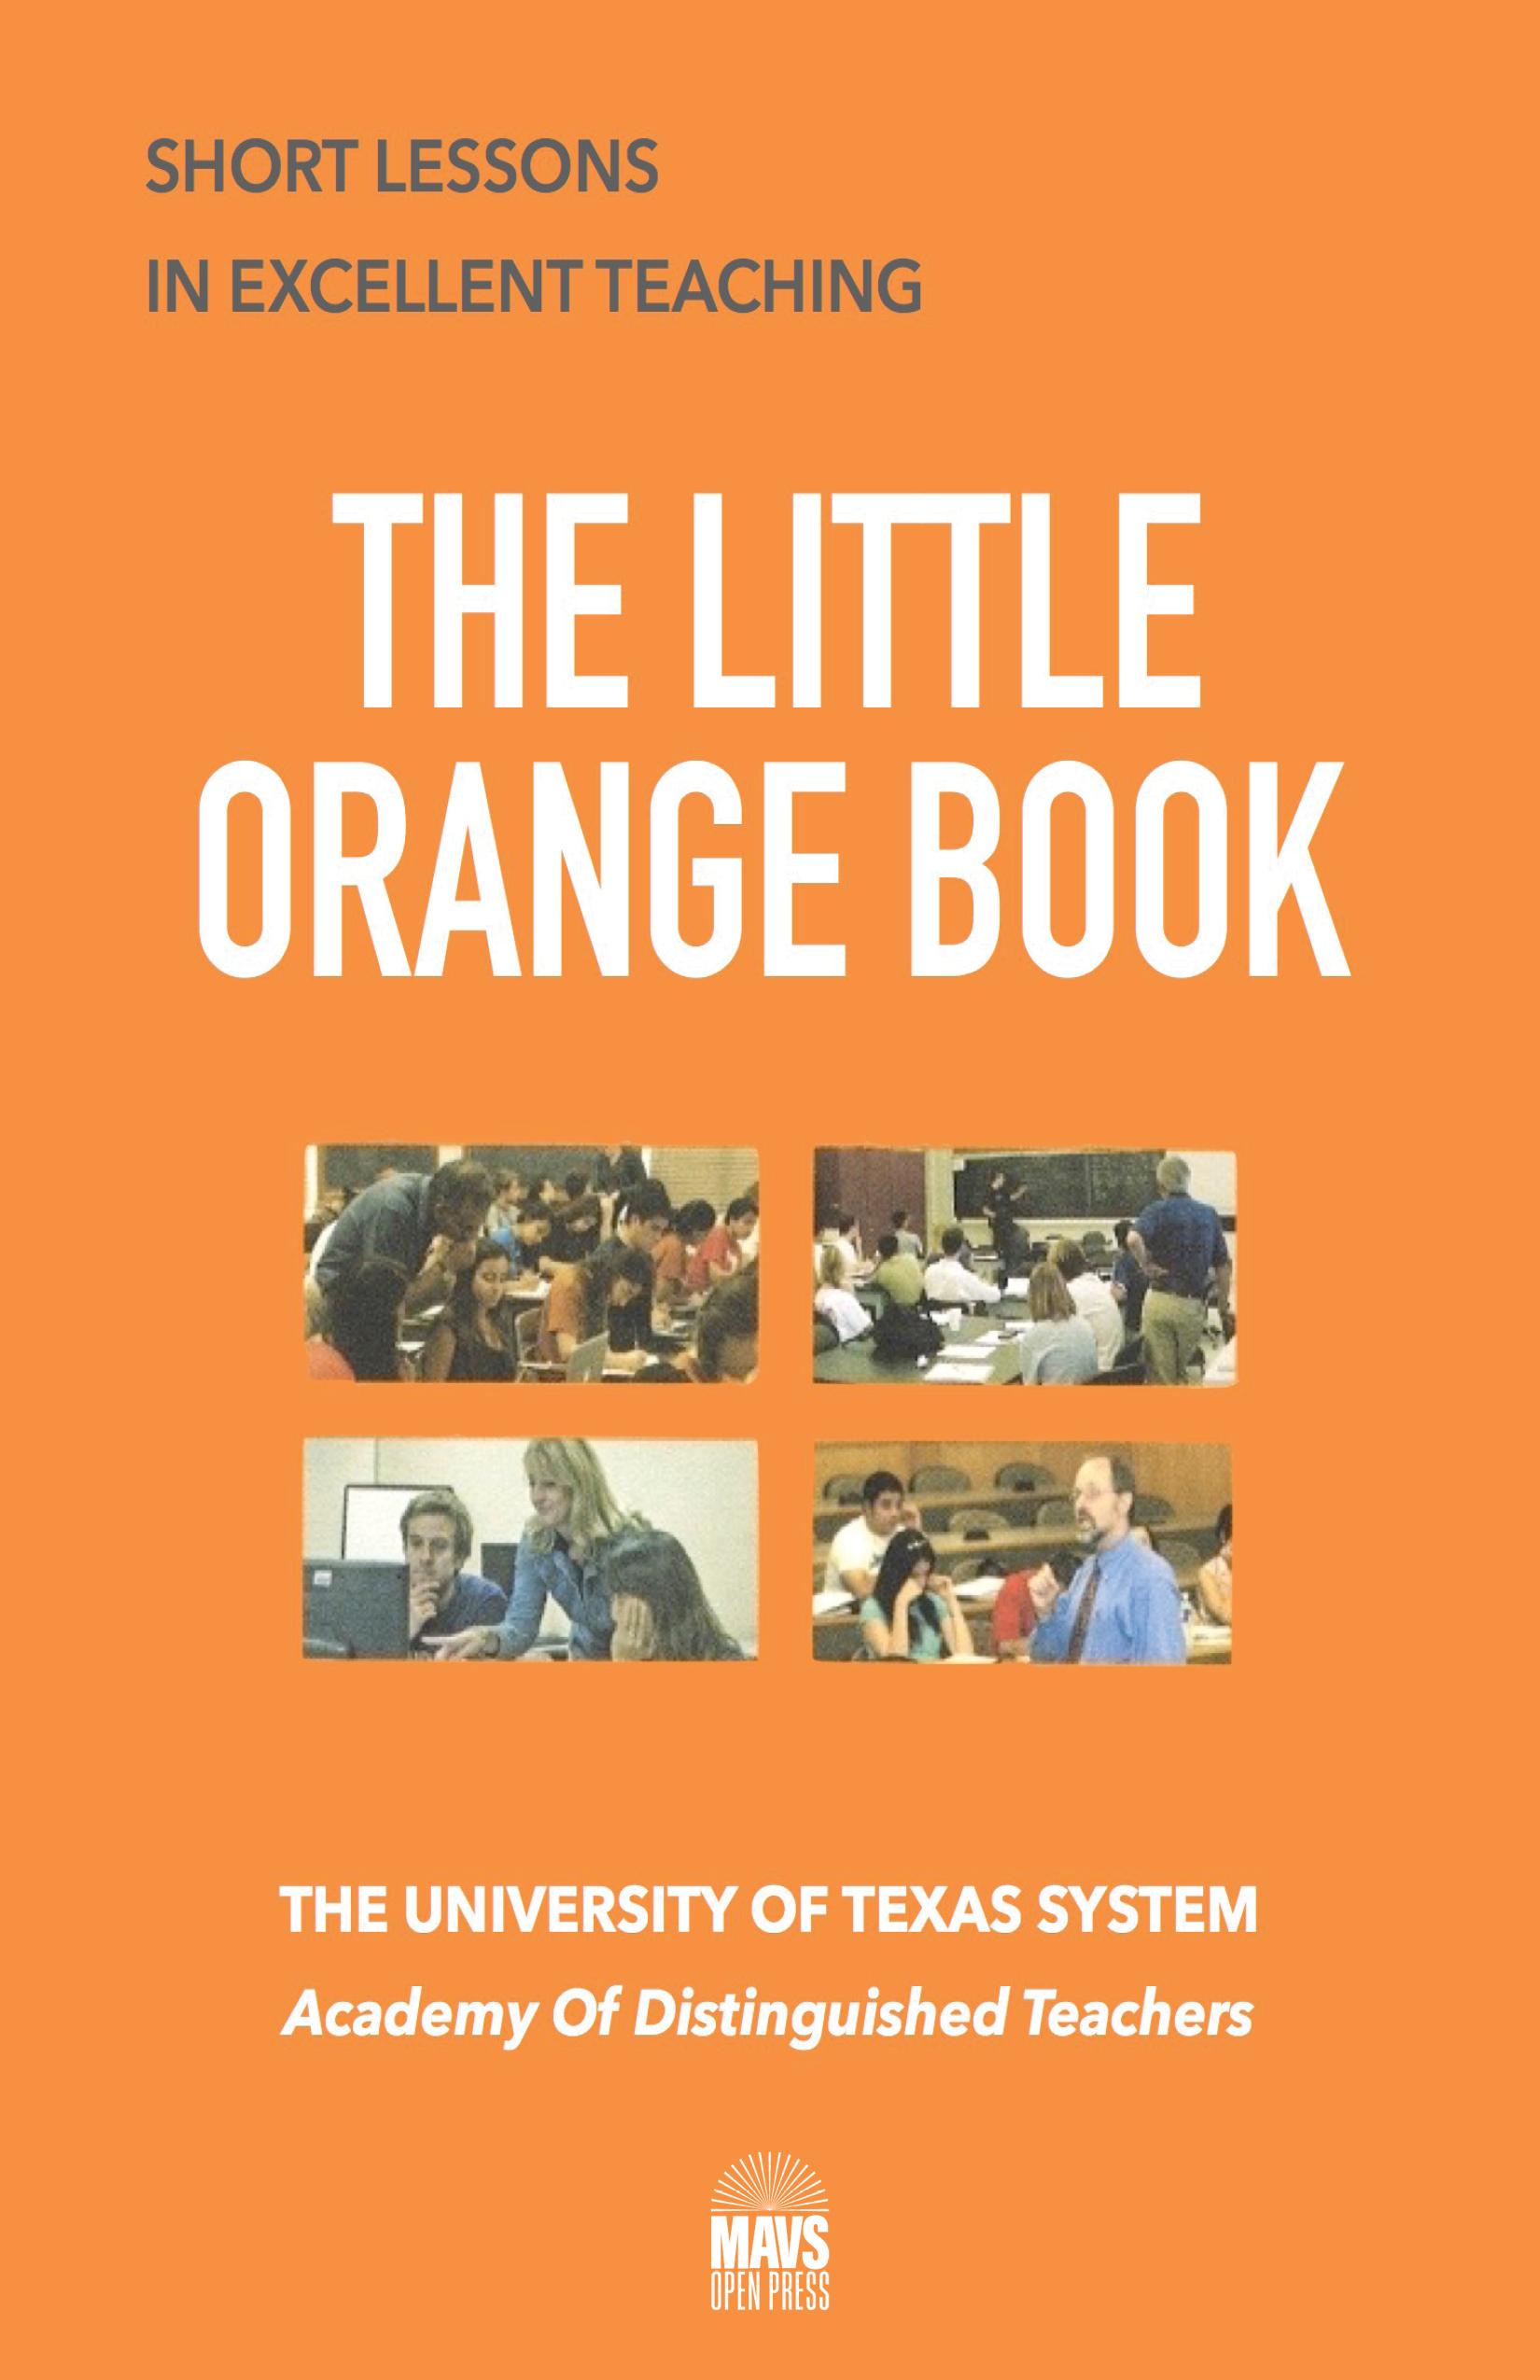 The Little Orange Book